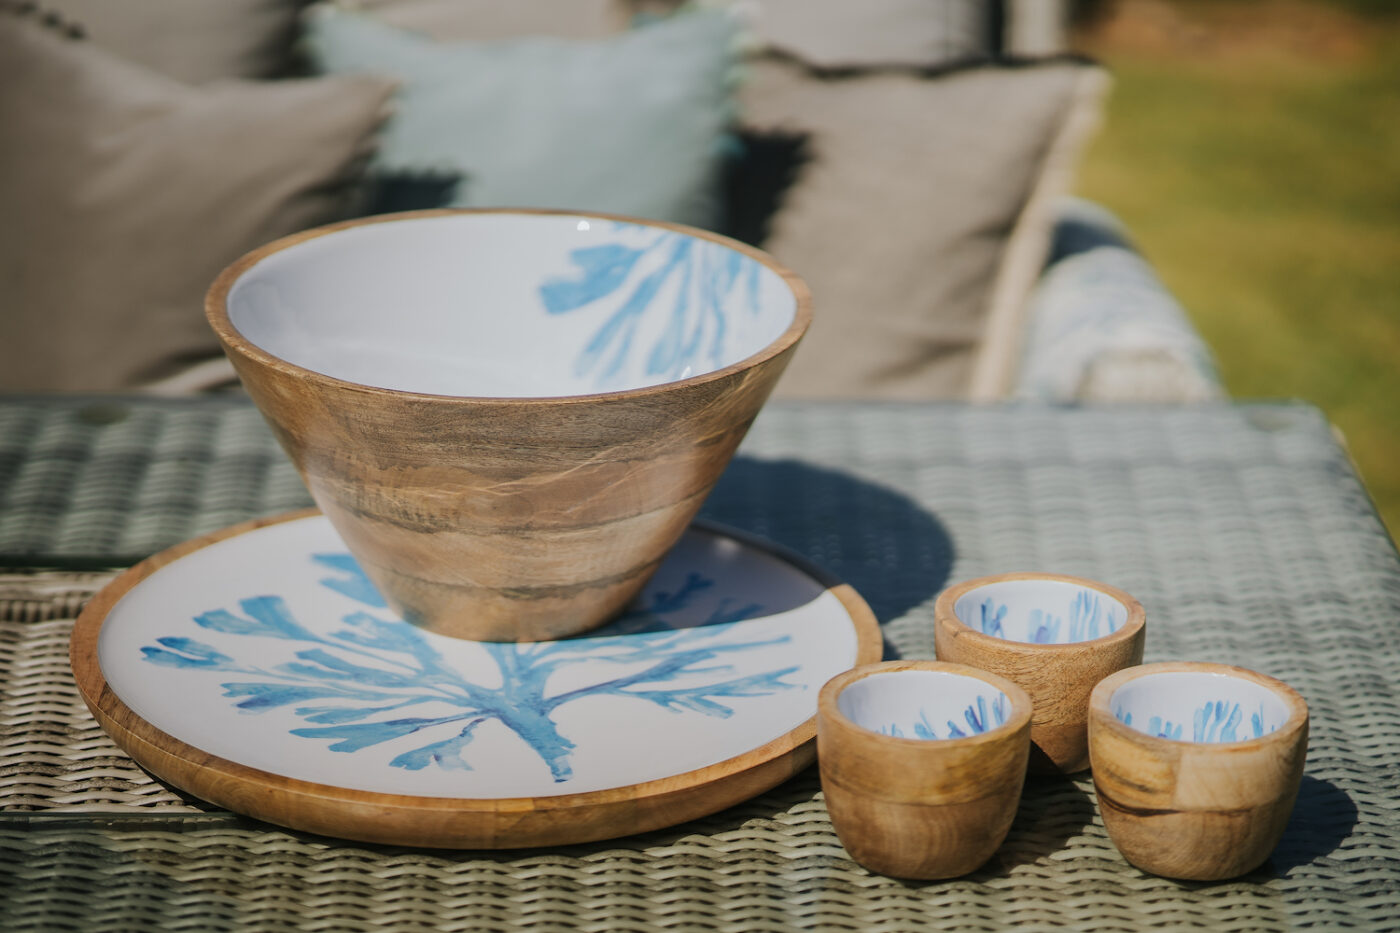 mango wood serving dishes seaweed design